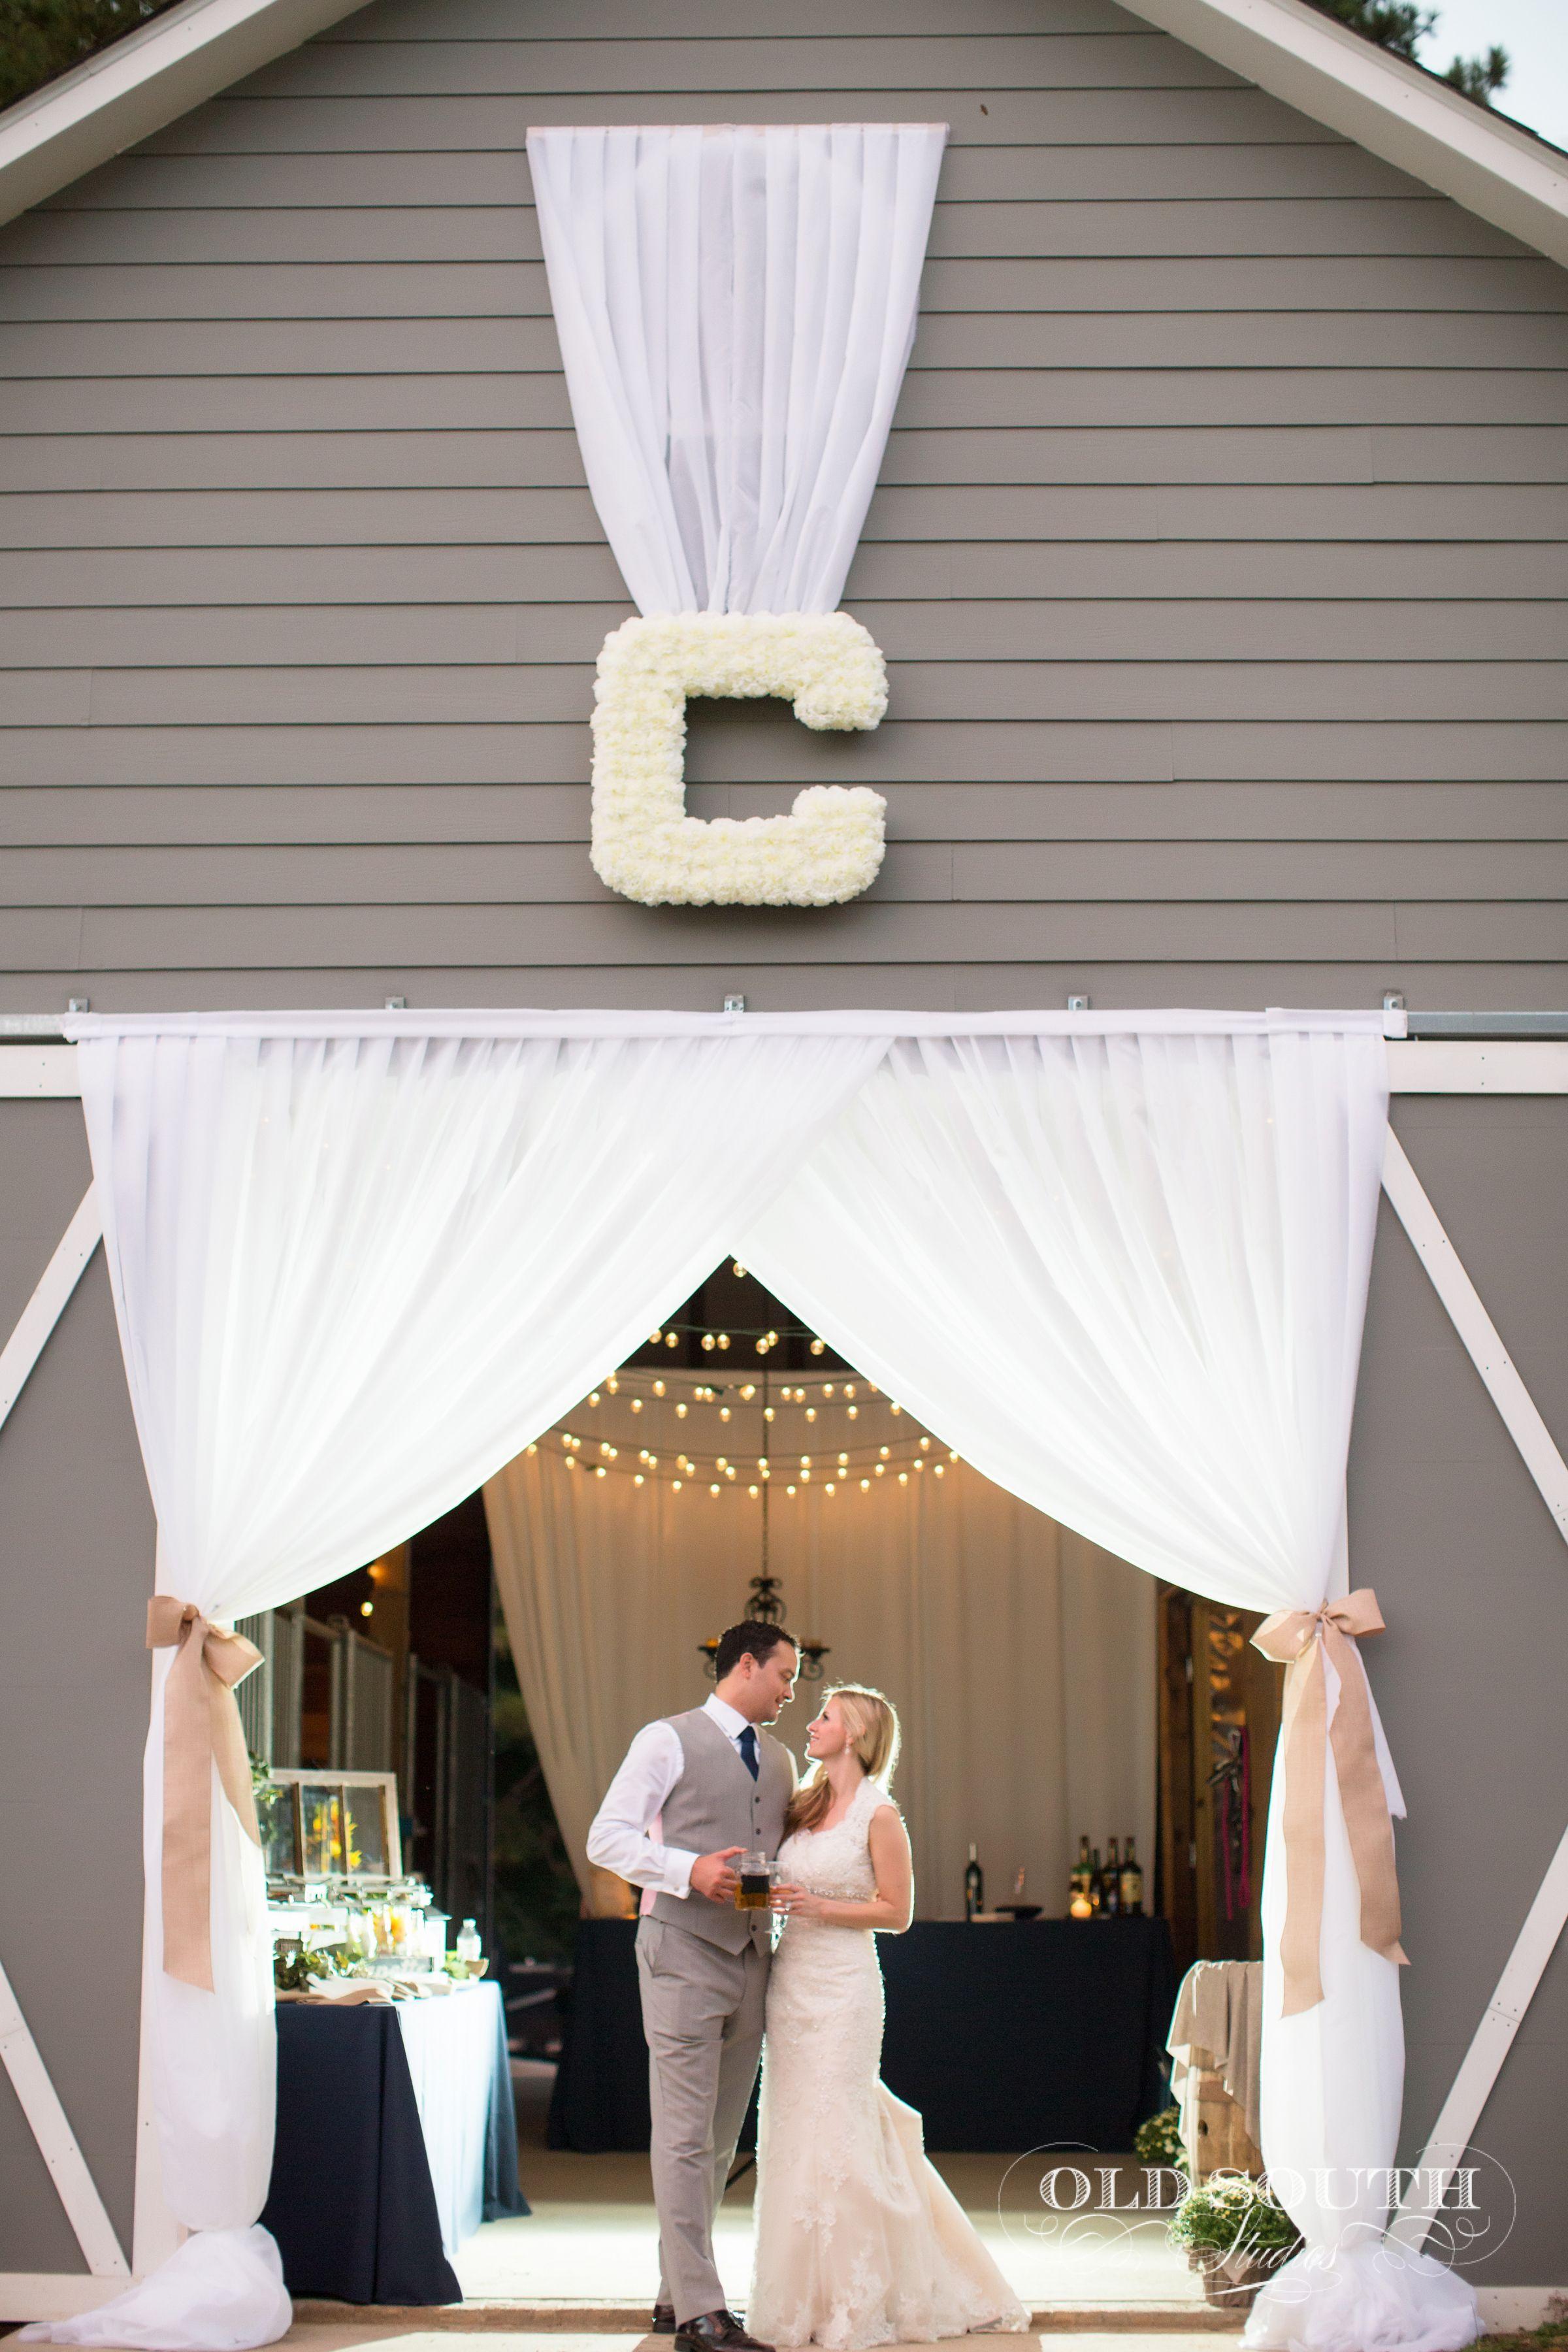 Barn Wedding Venue Weddings Decor Horse Barns Chapel In The Woods Franklin County Planning Farms Haciendas